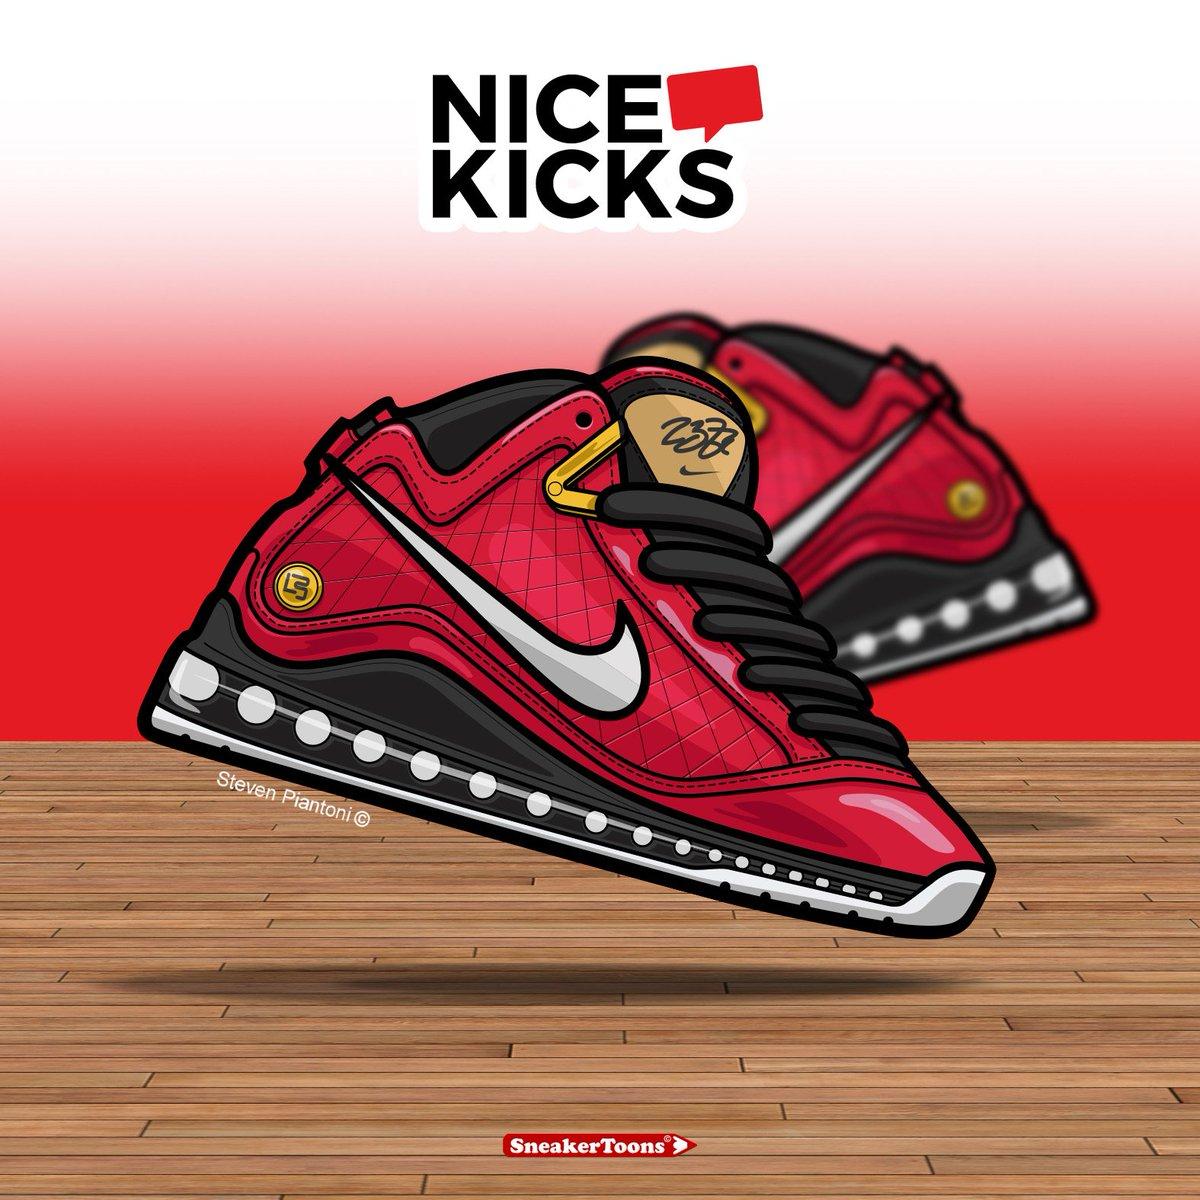 exclusive kicks